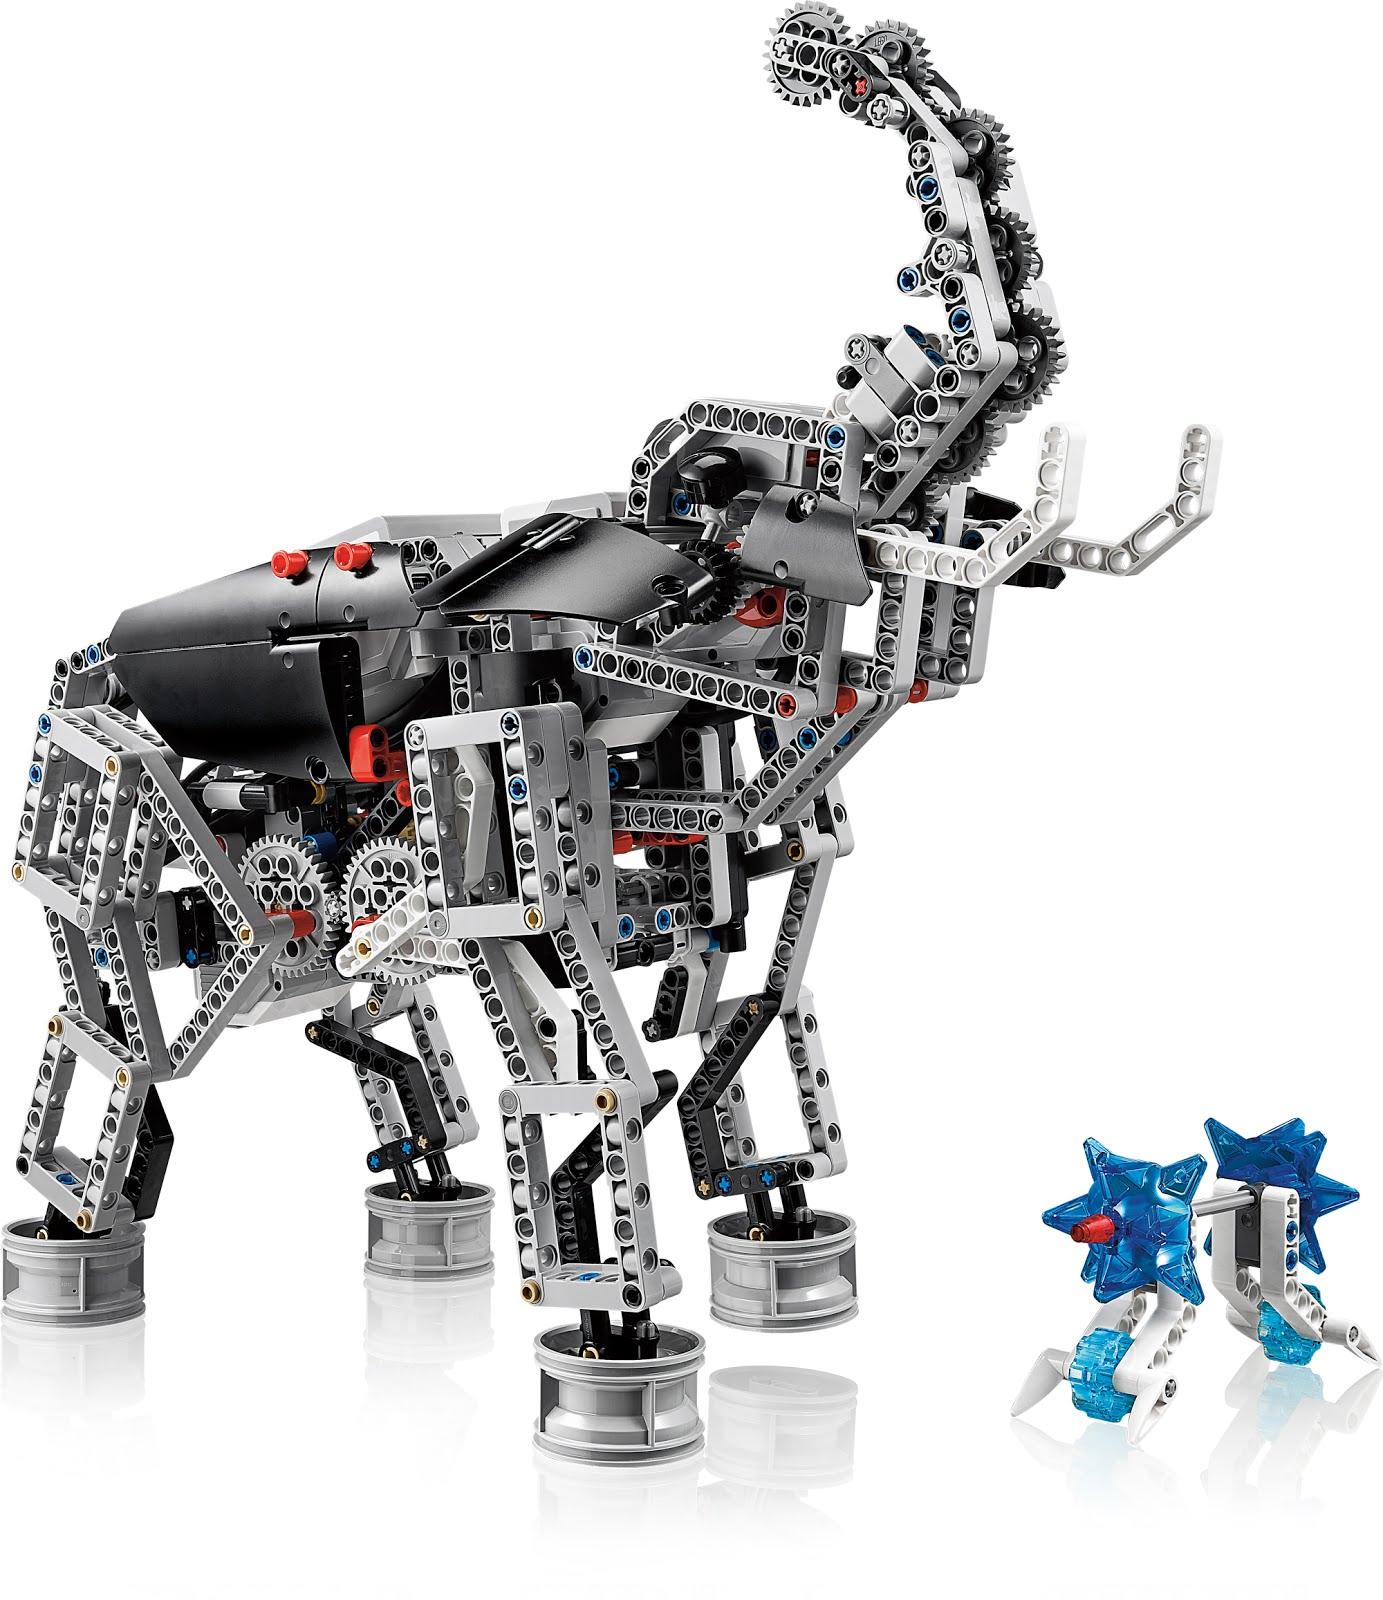 Lego mindstorms ev robotas konstruktorius